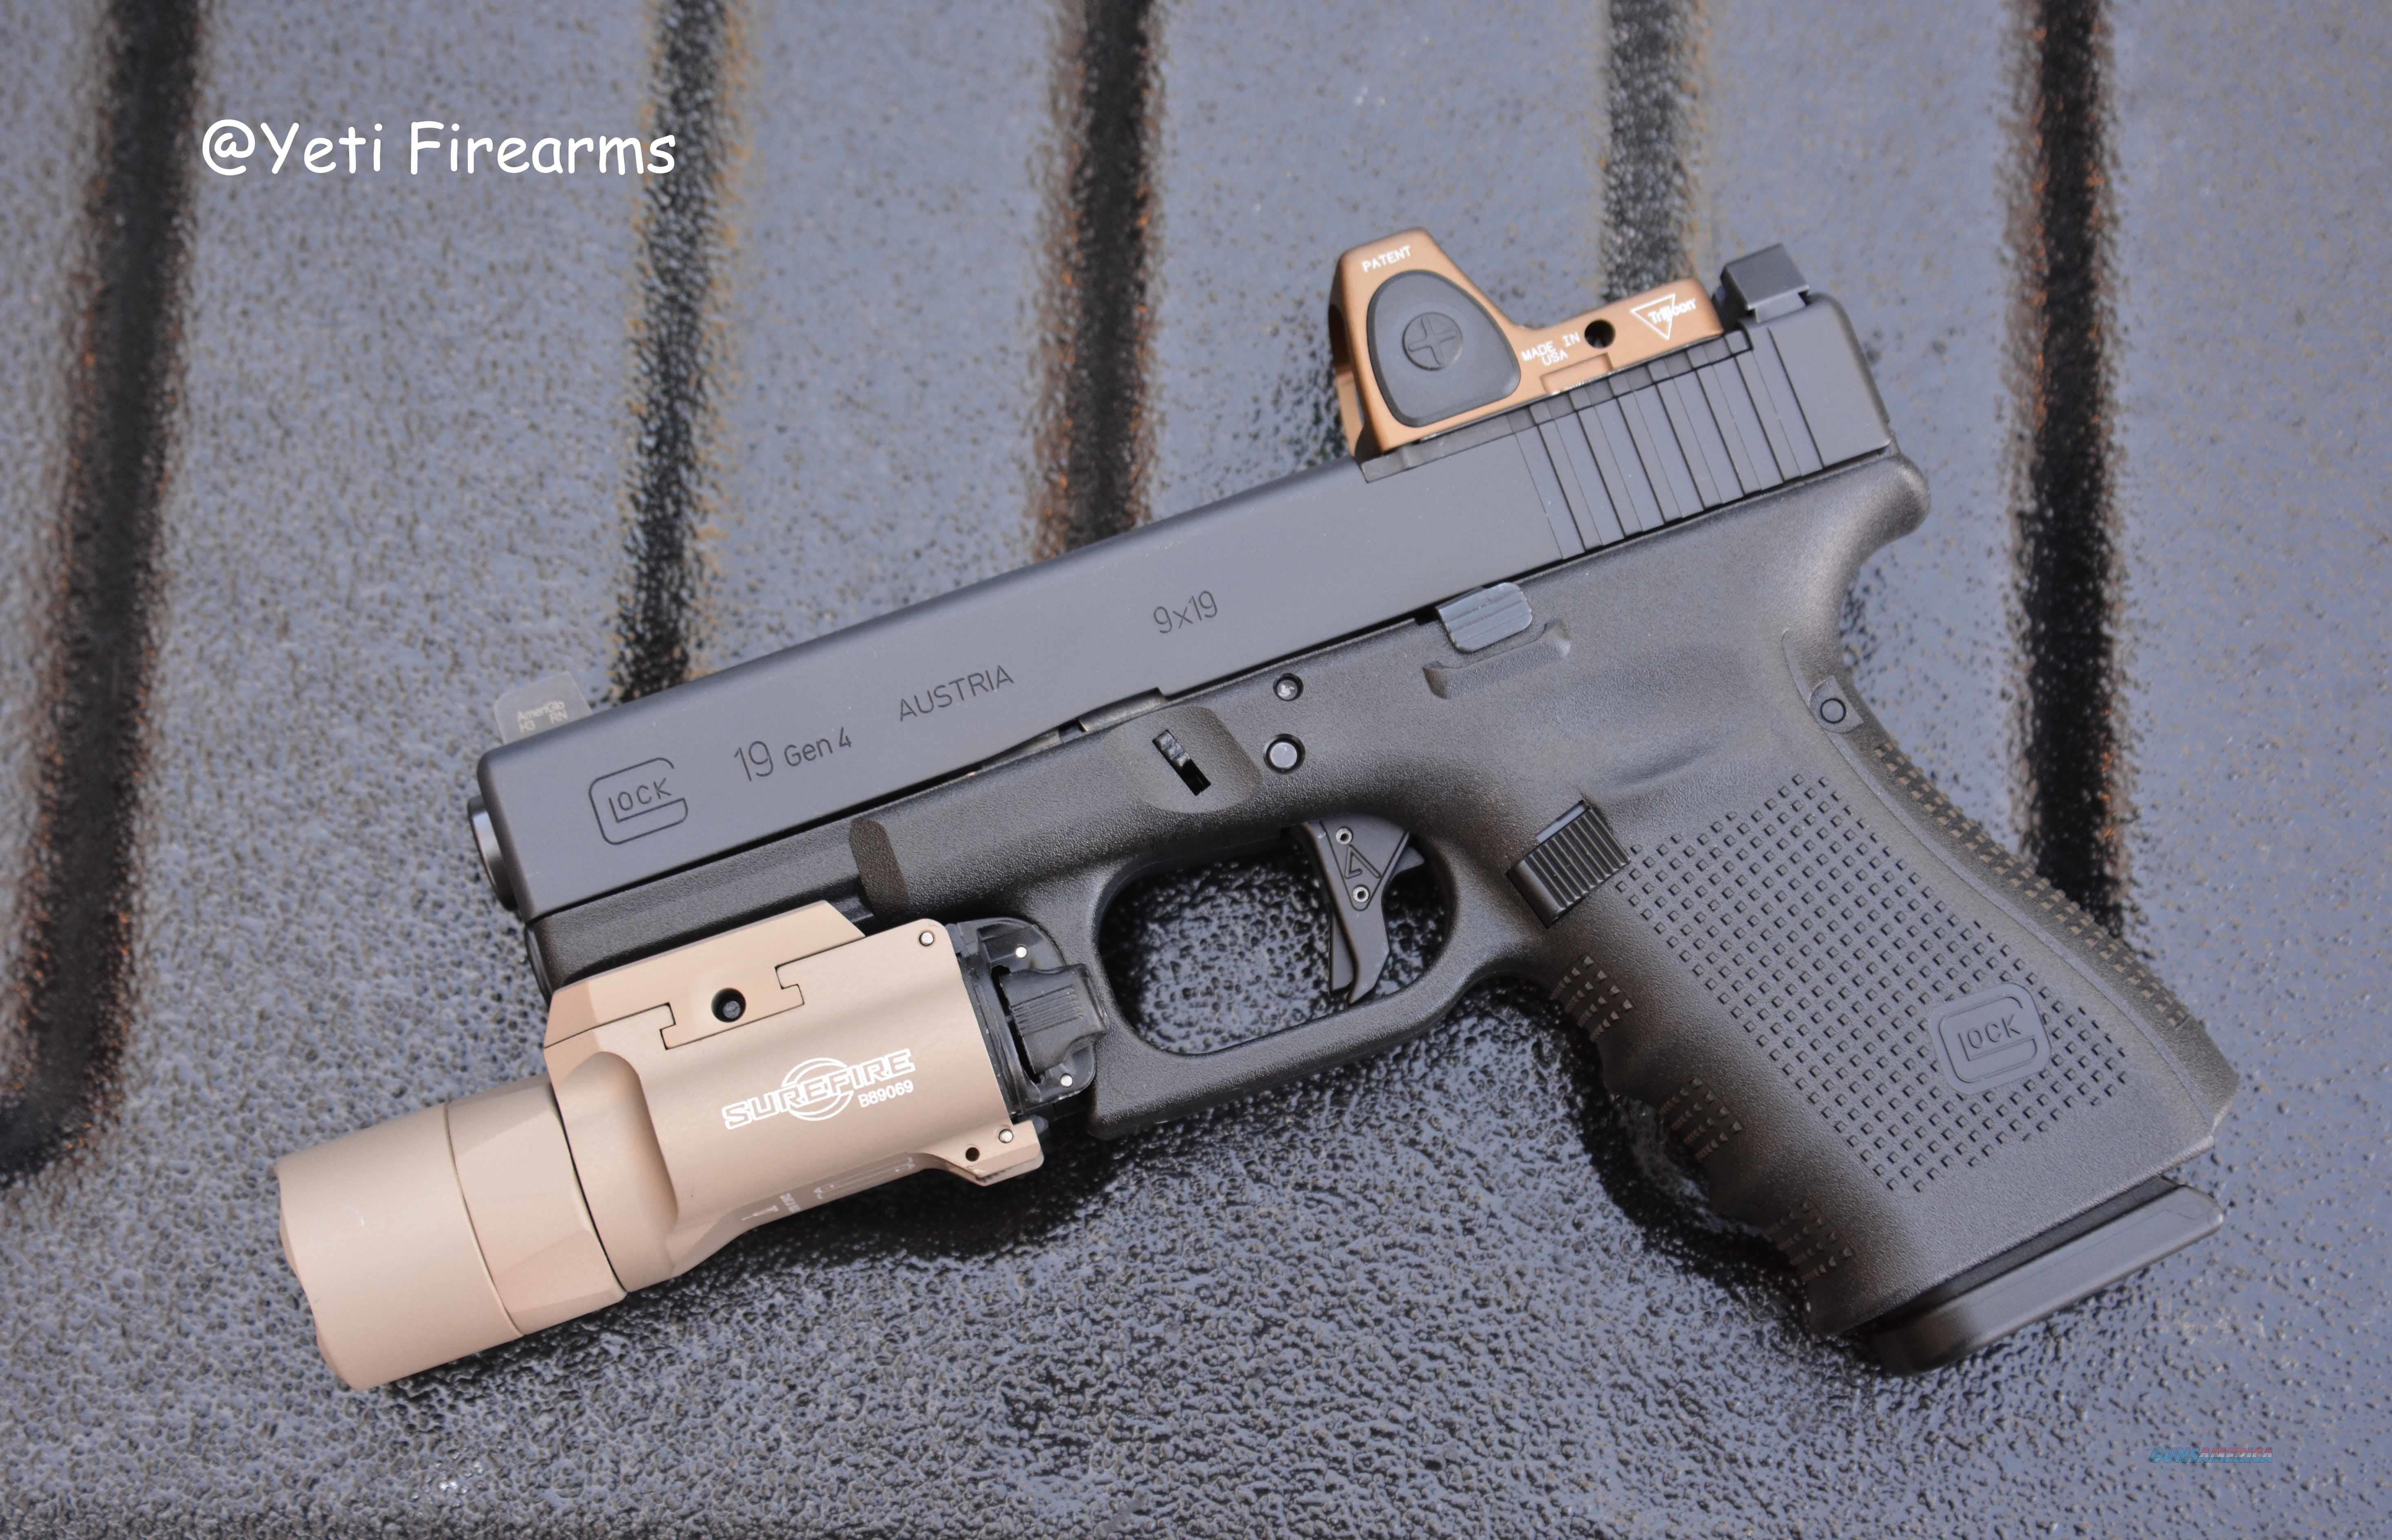 Glock 19 G4 MOS 9mm RM06 HRS SF X300 Agency Arms  Guns > Pistols > Glock Pistols > 19/19X